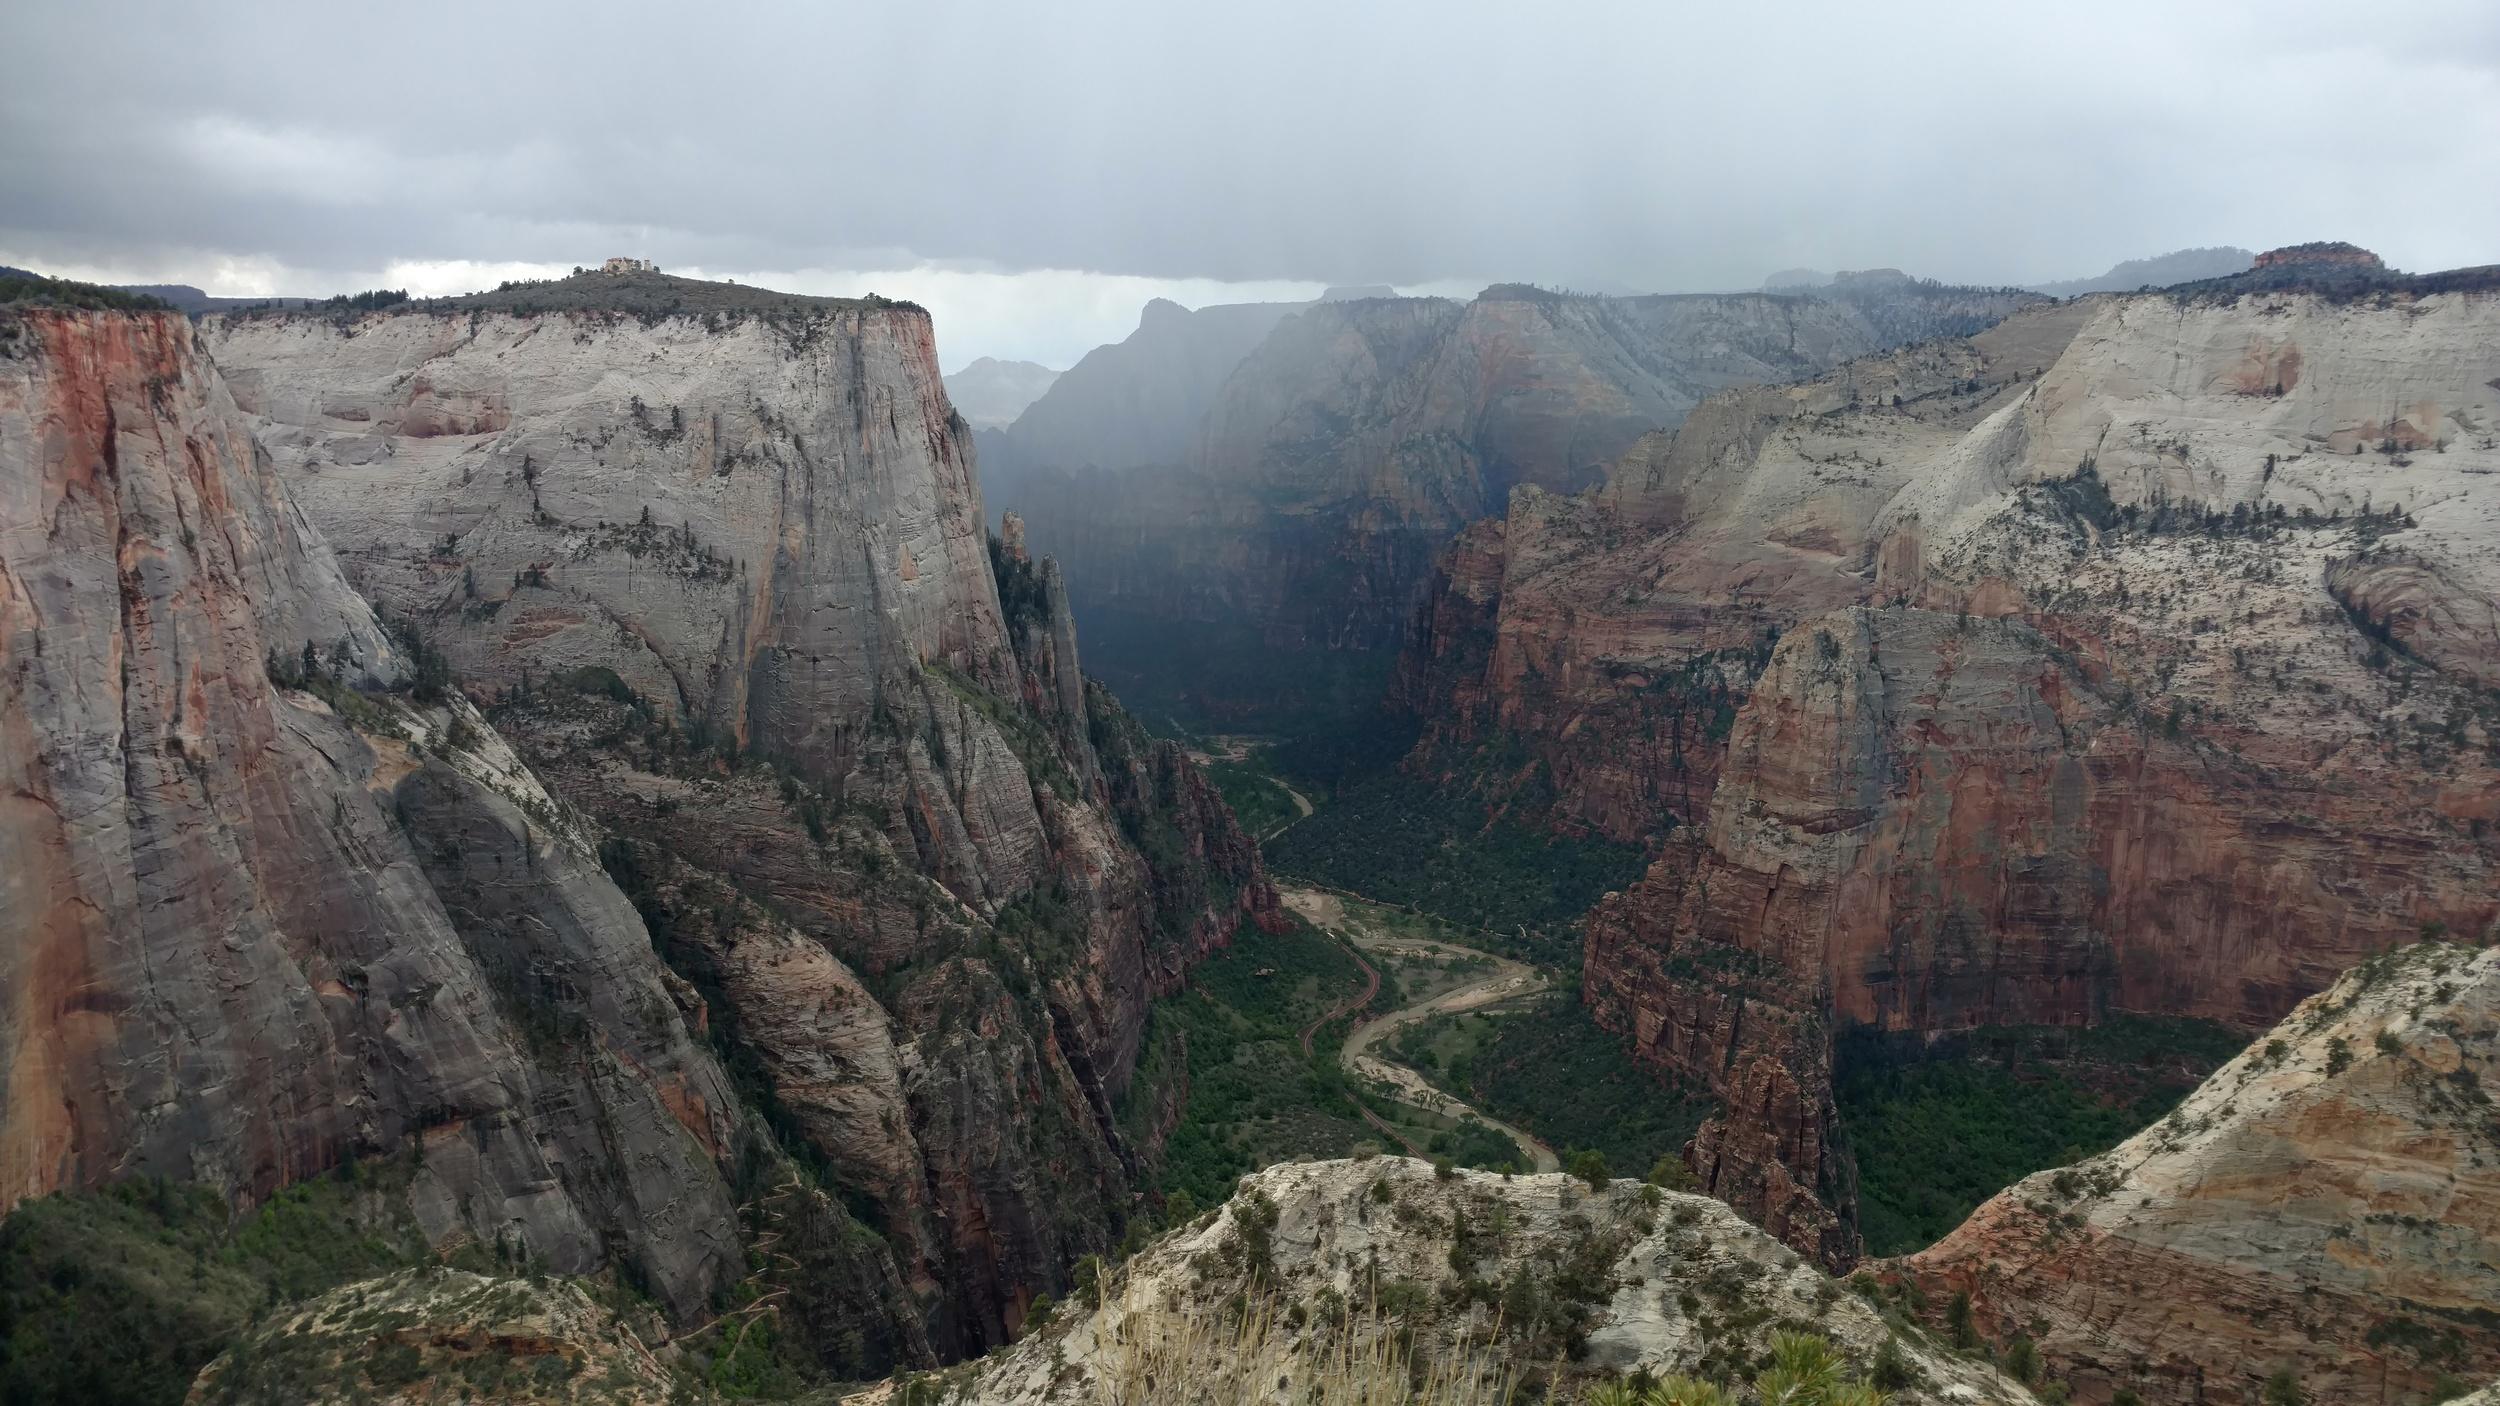 Storm misses us, blowing along Kolob Terrace and through Behunin Canyon.